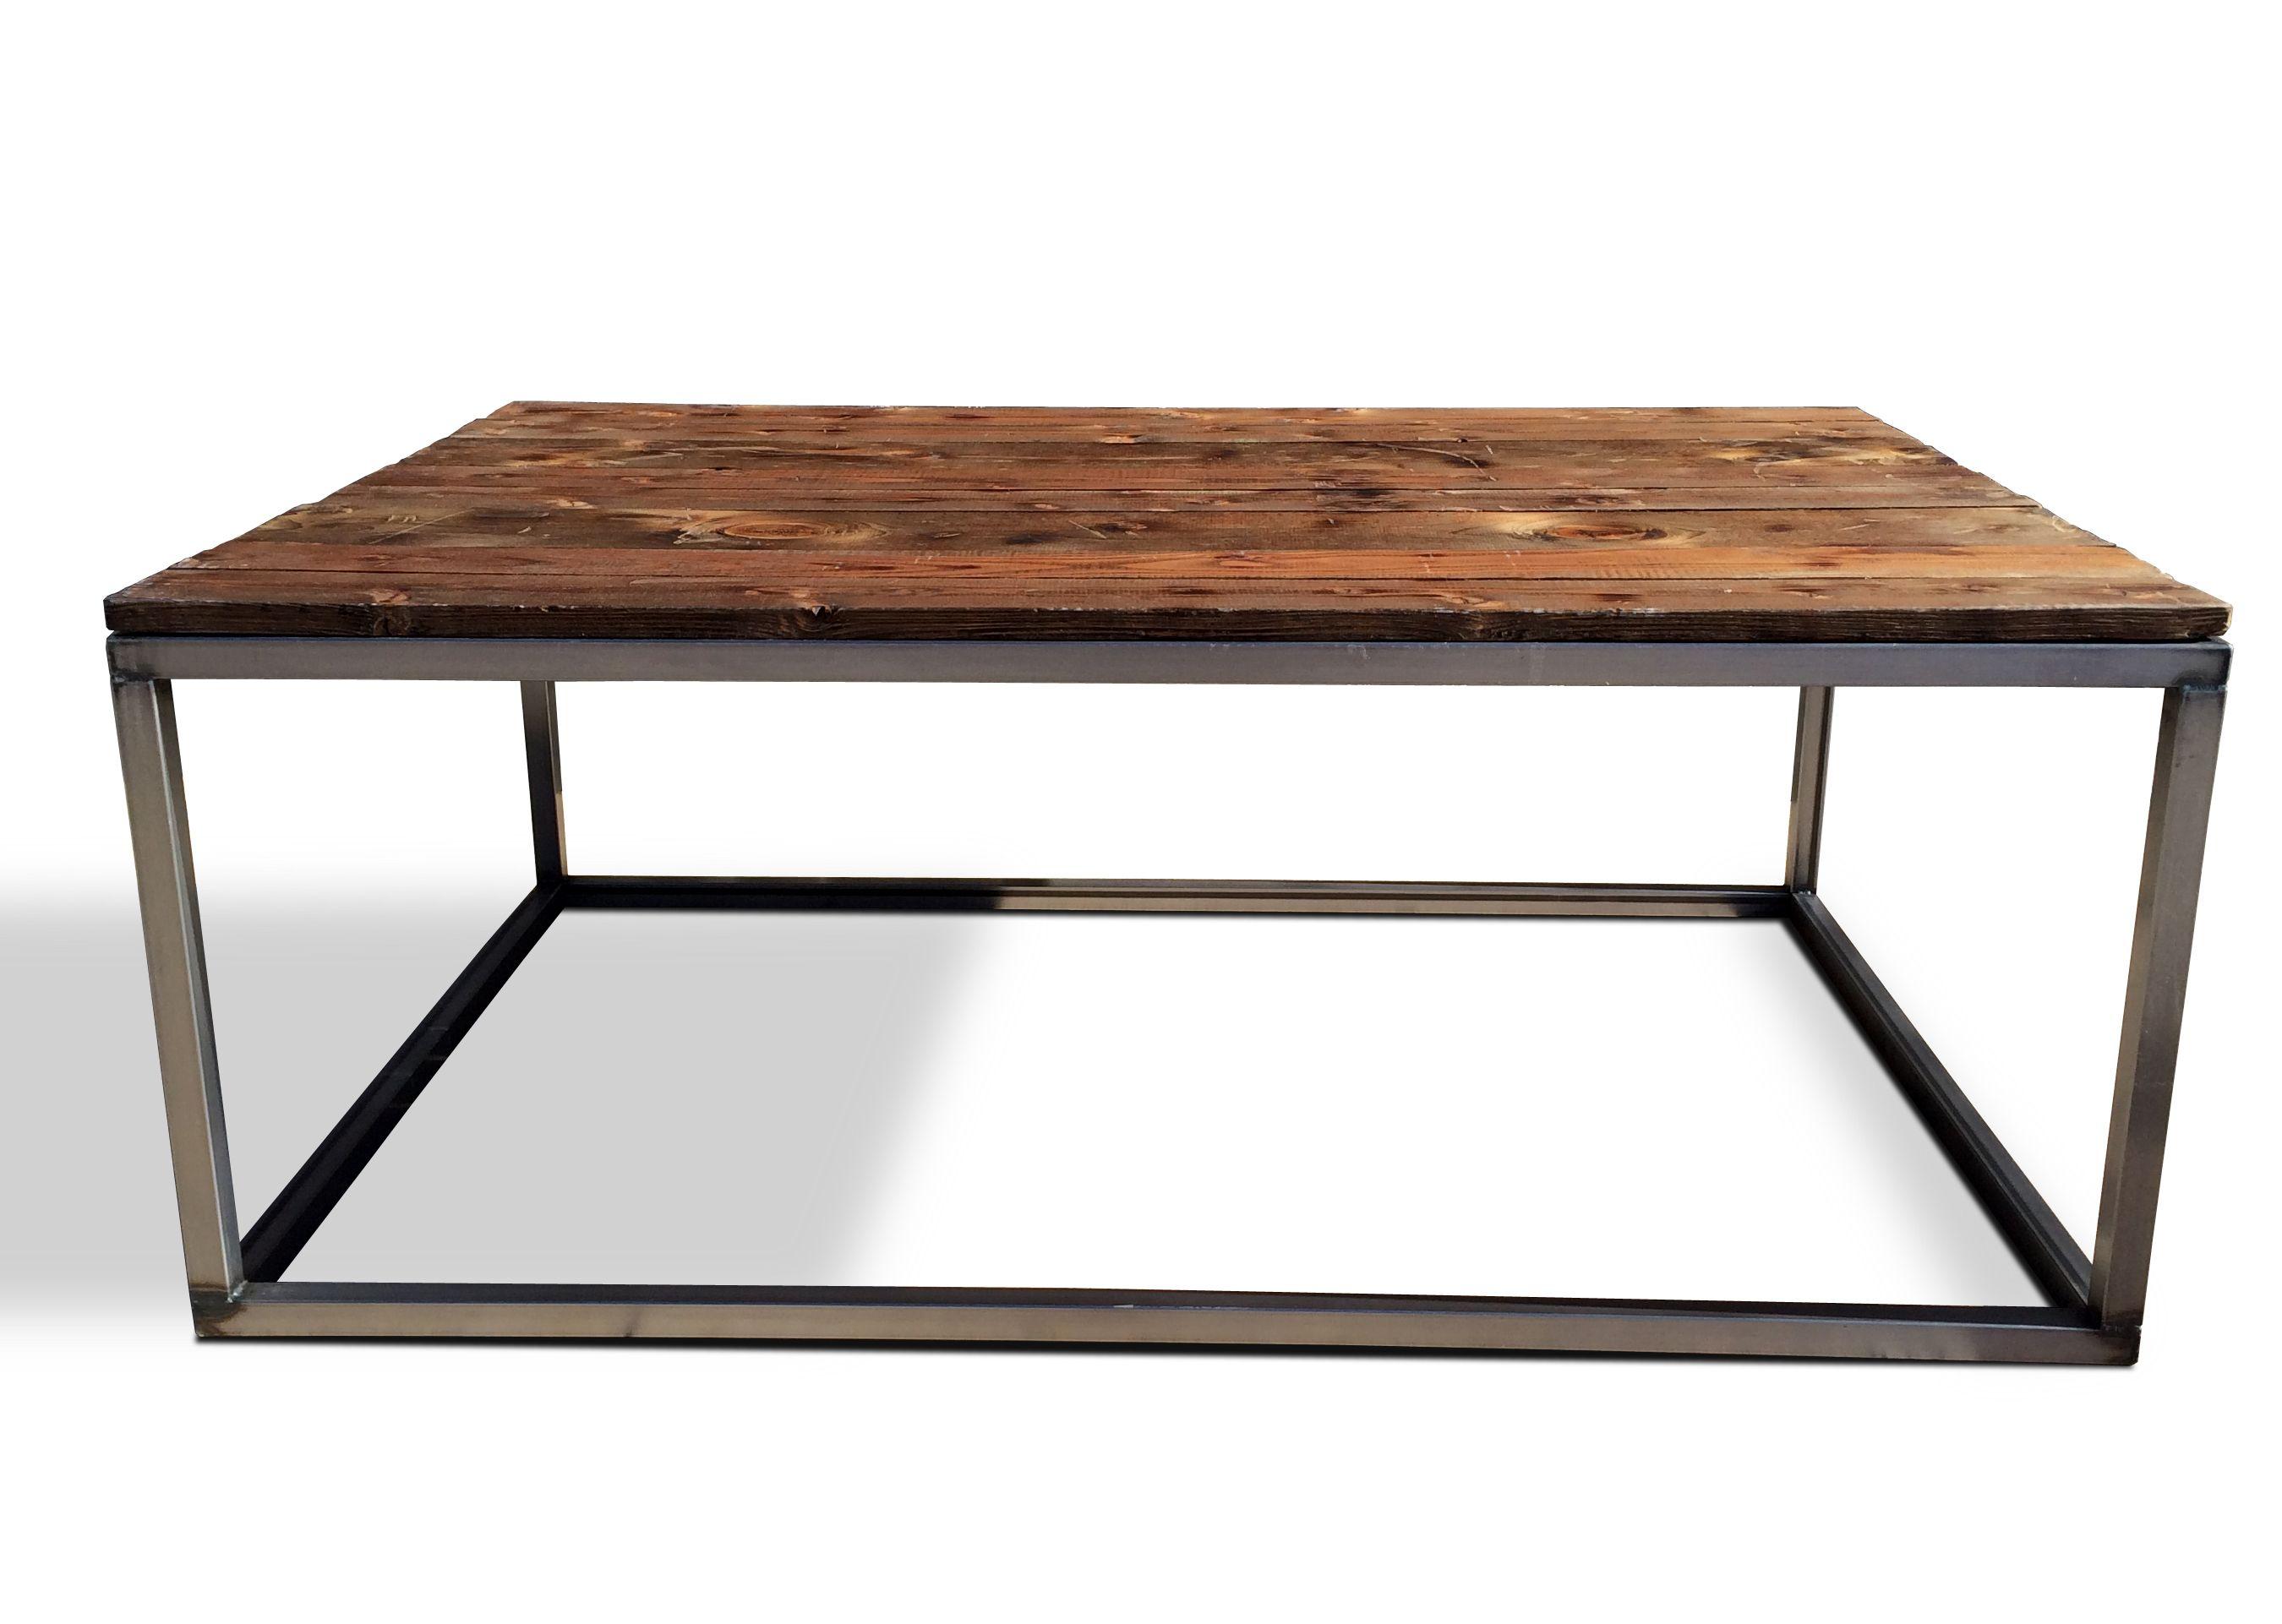 Modern Coffee Table In Denver Colorado. Industrial Coffee TablesModern ...